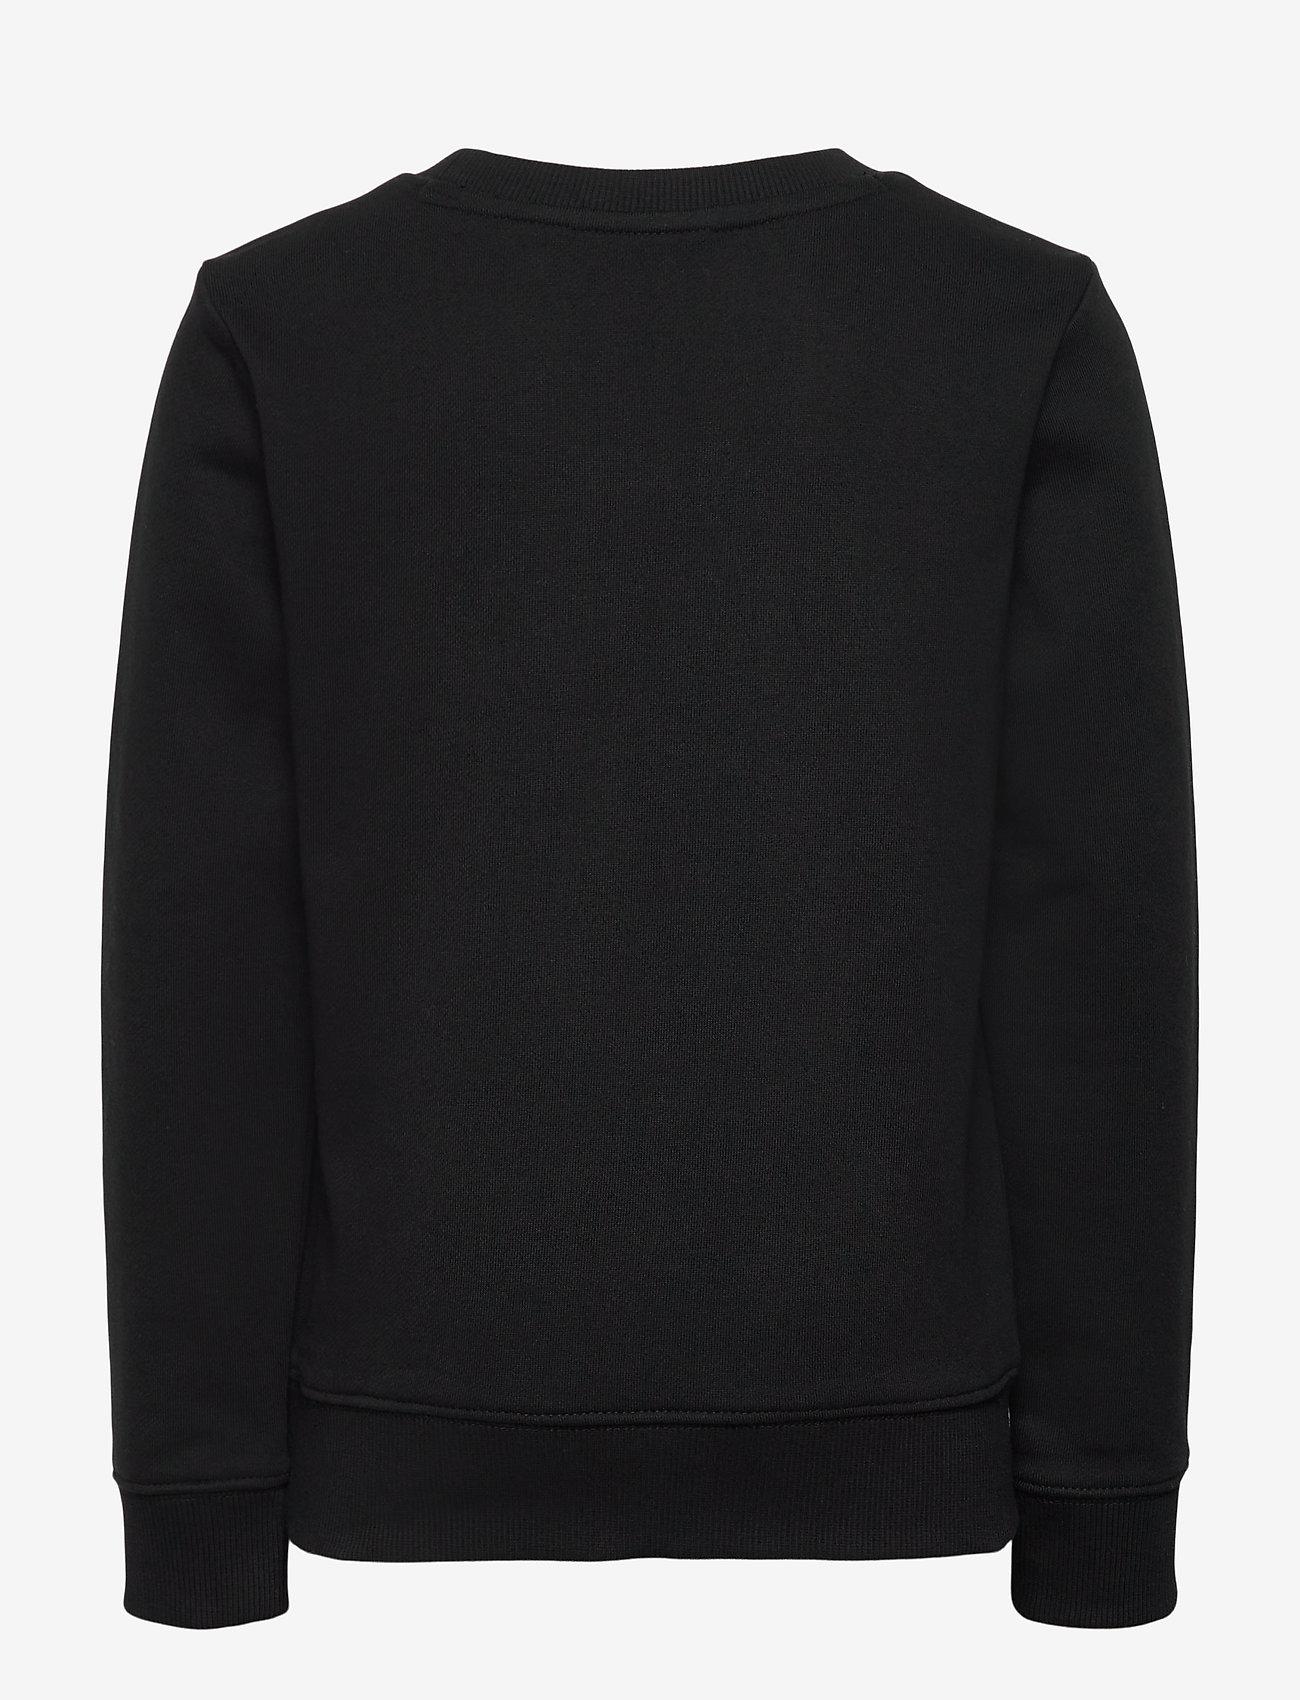 Calvin Klein - REFLECTIVE LOGO SWEATSHIRT - sweatshirts - ck black - 1